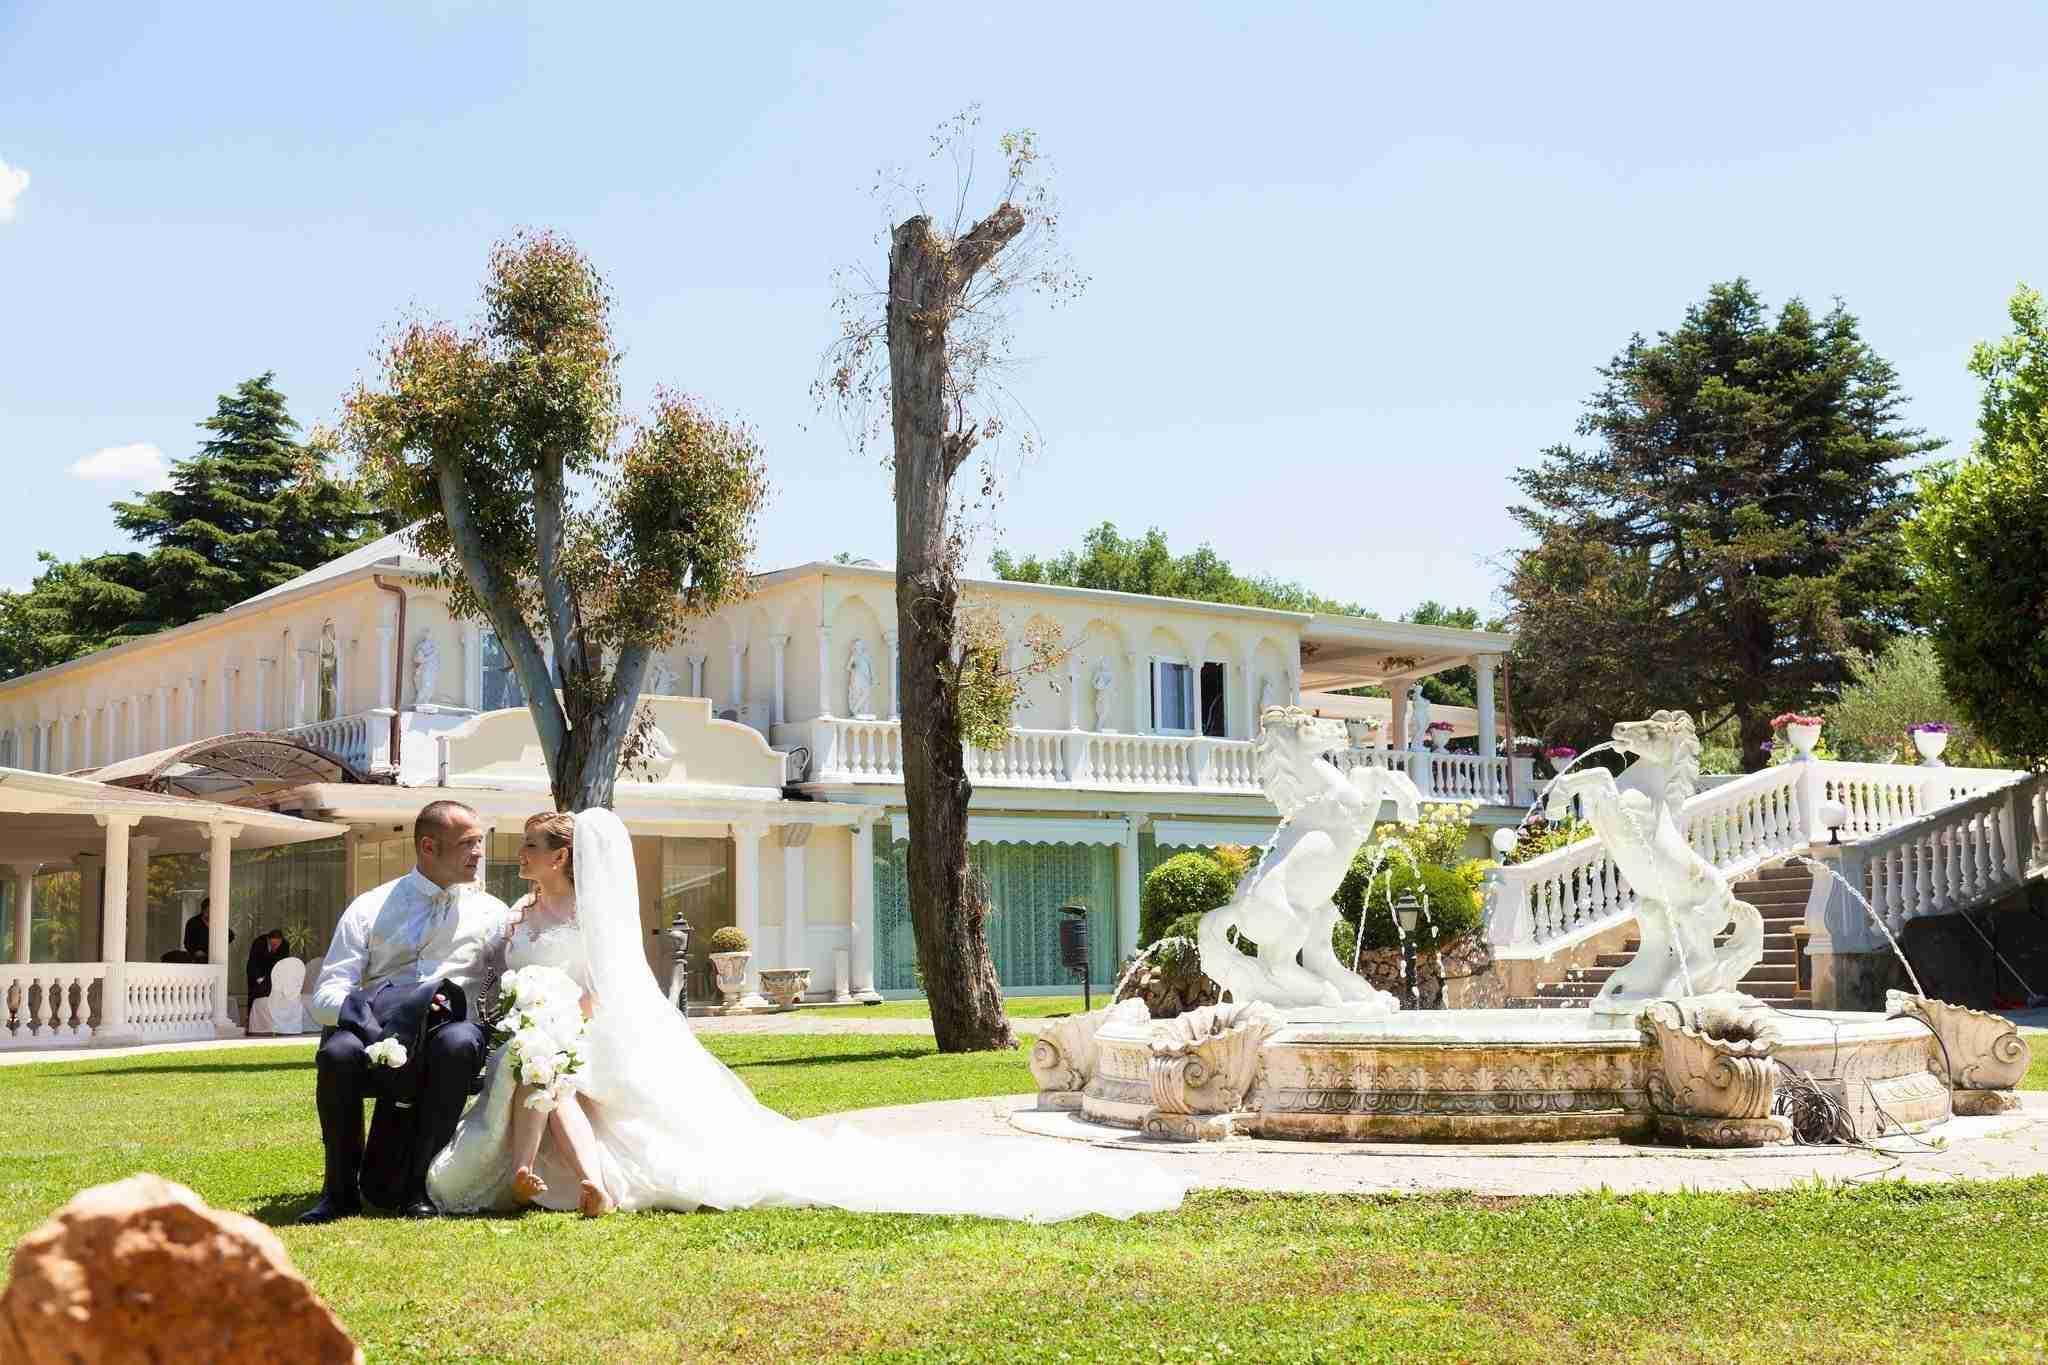 Matrimonio in Villa lago dei cigni: giardino, fontana